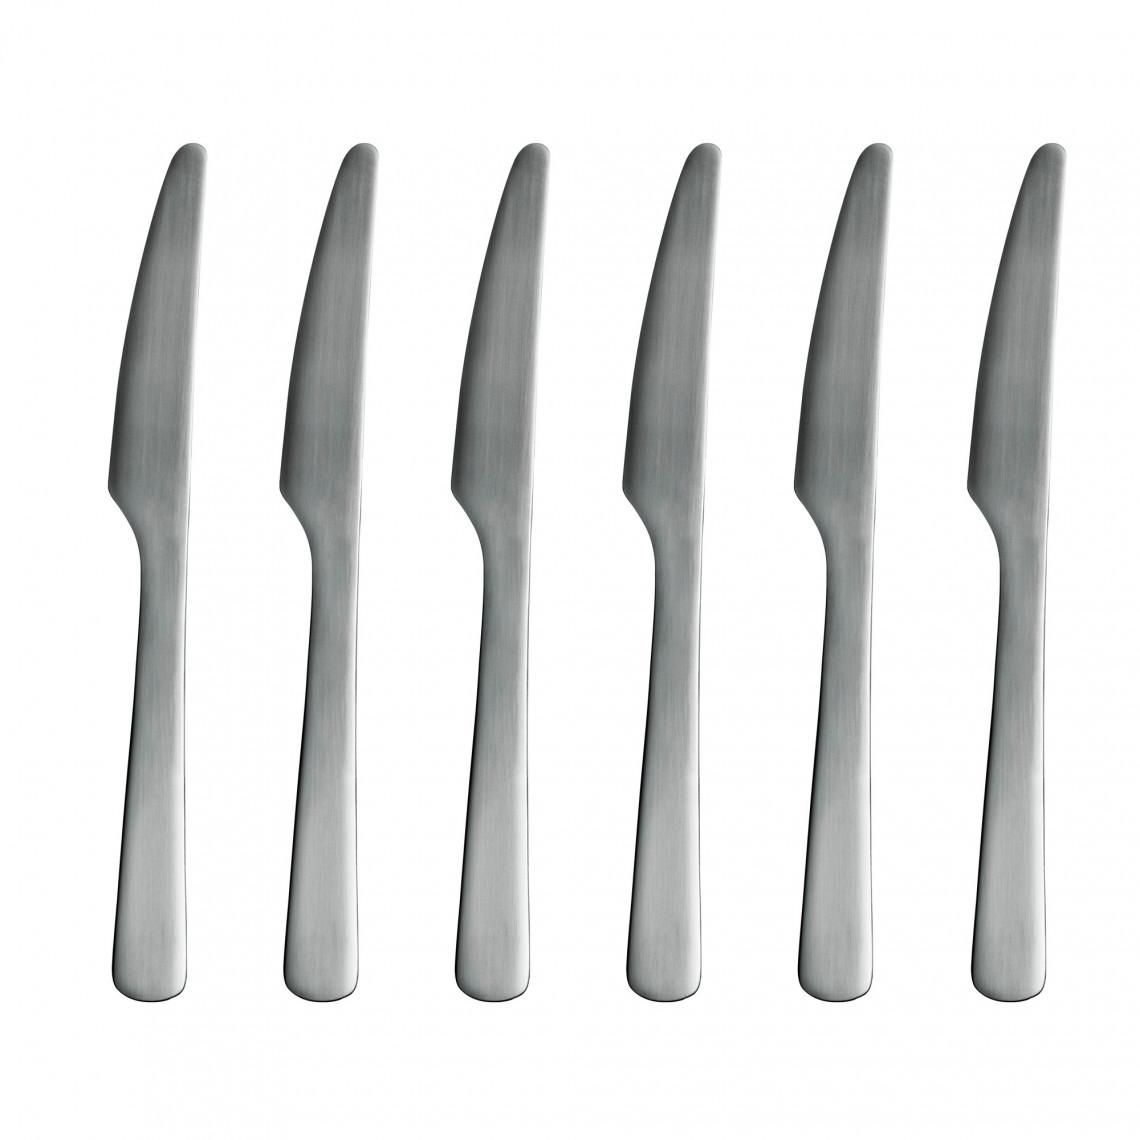 Knivar Normann Cutlery Knives - 6 pack